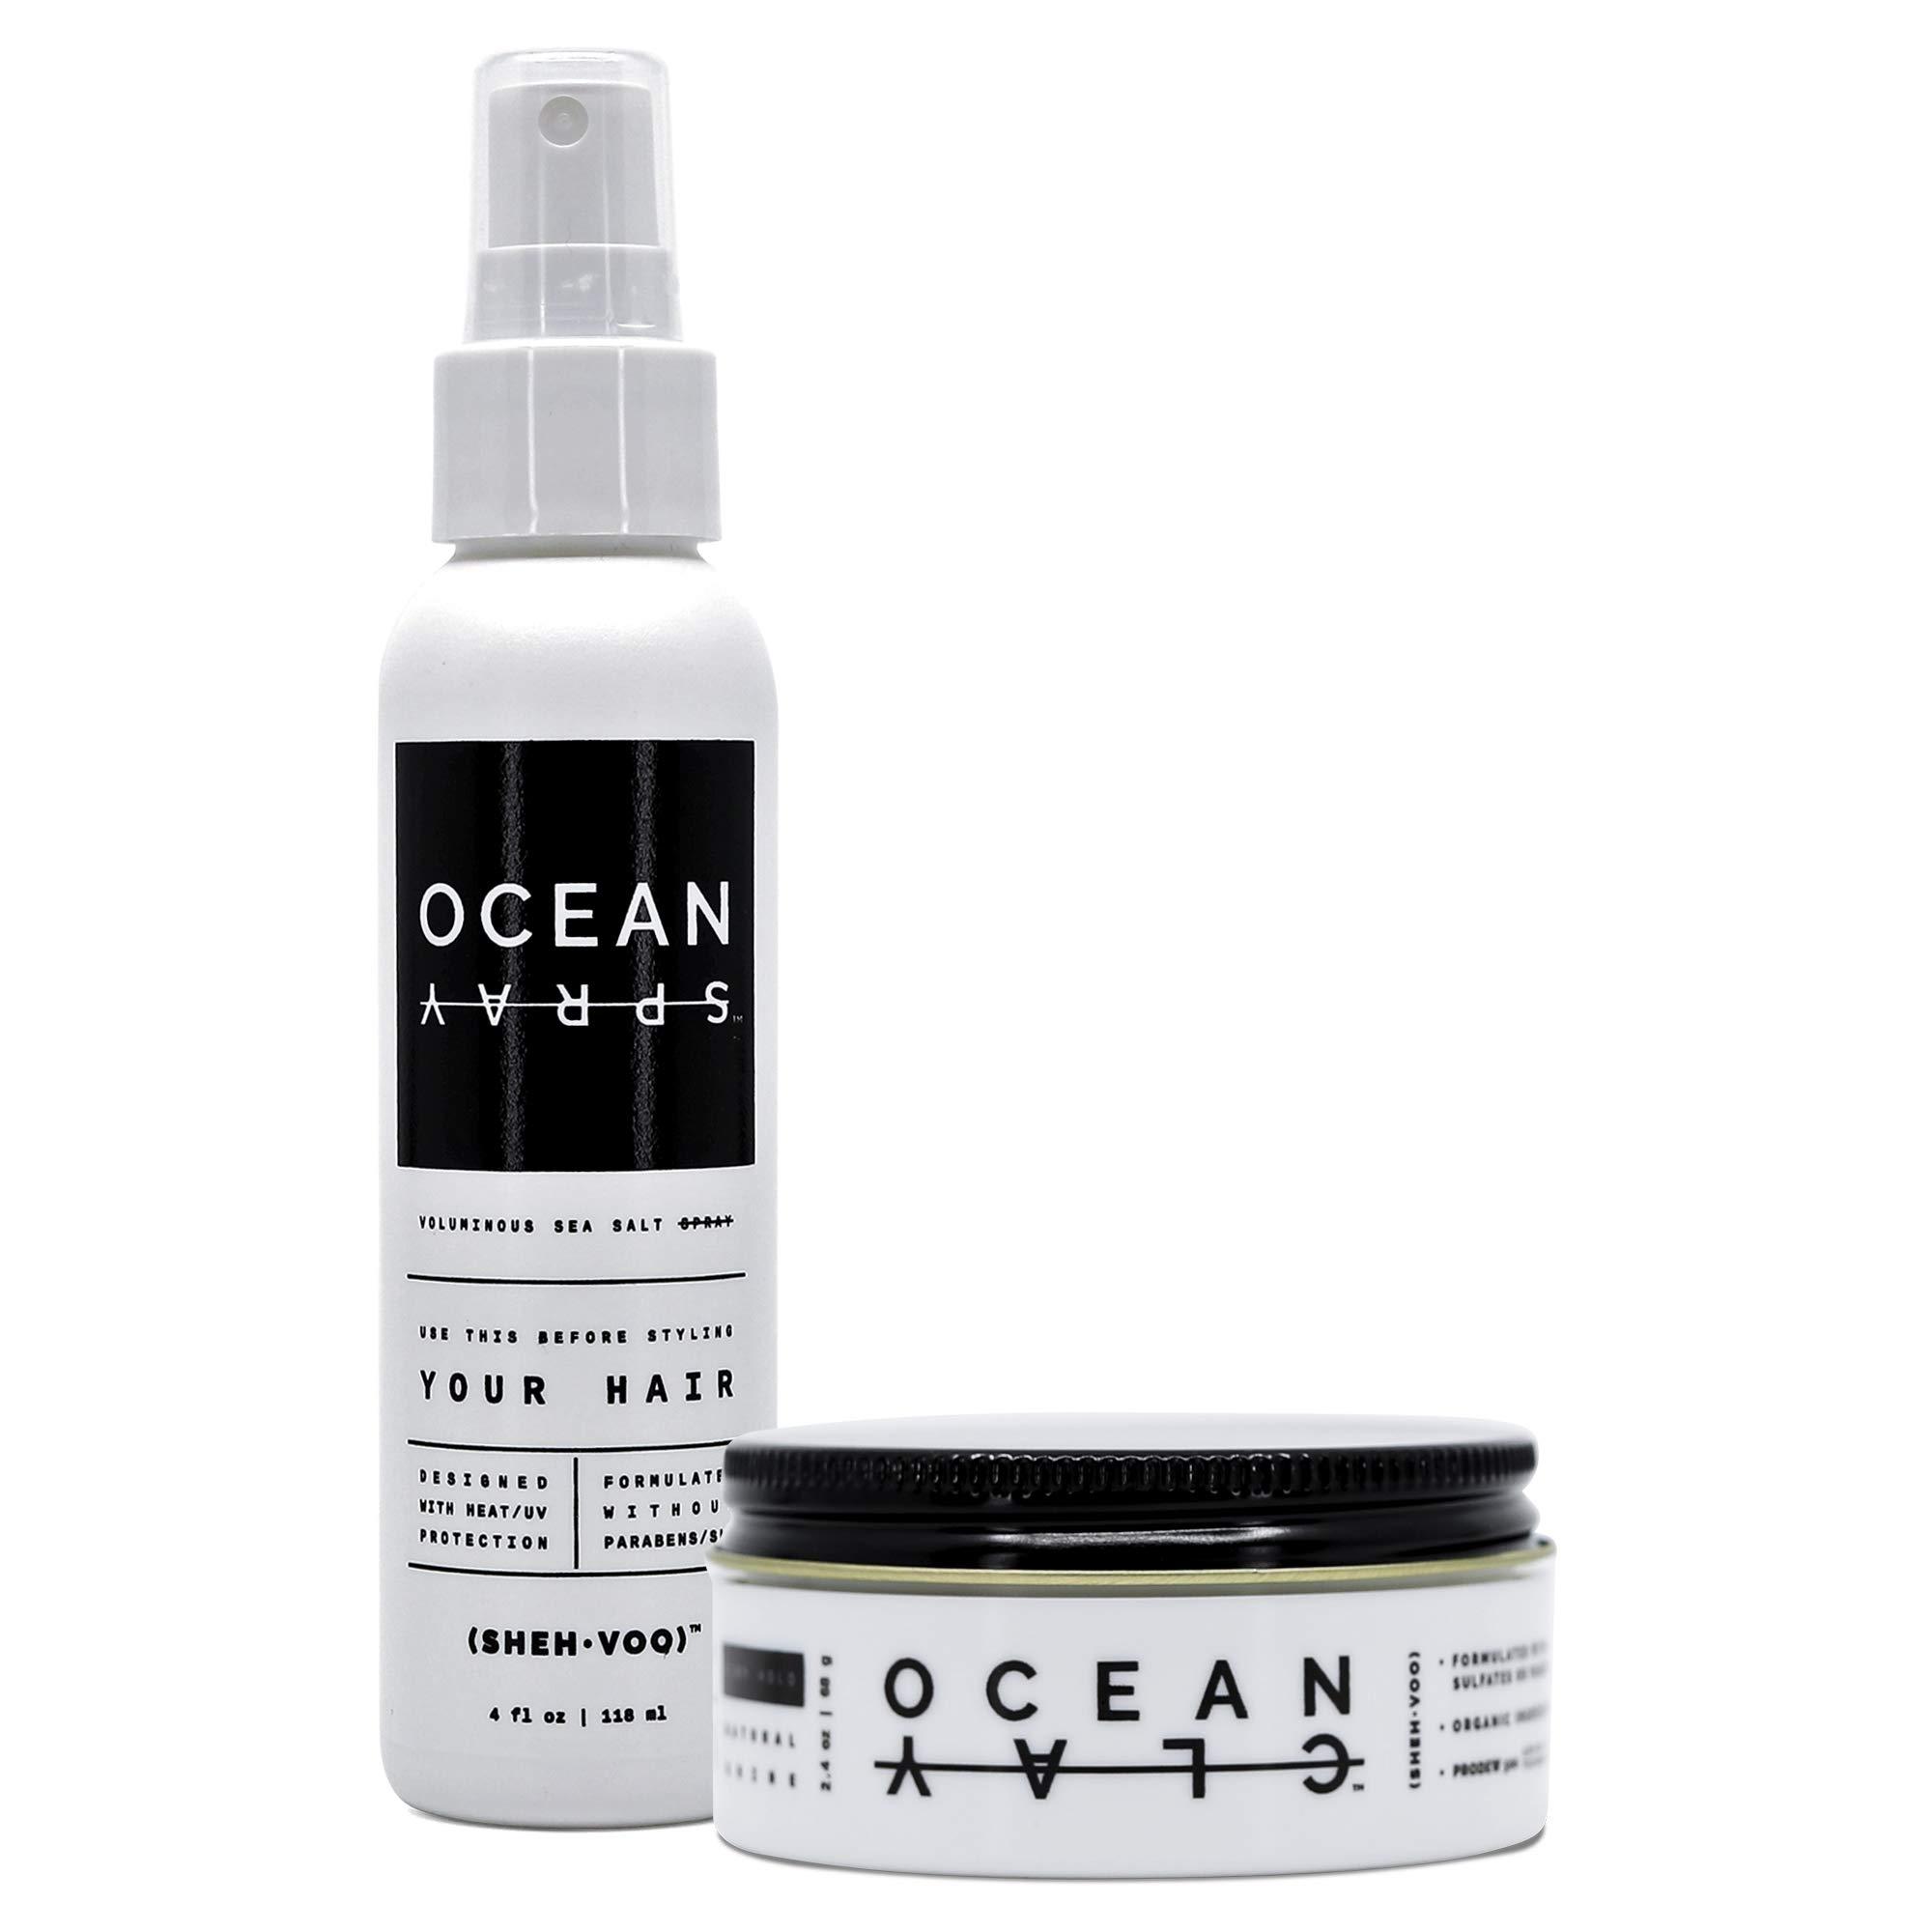 (SHEH•VOO) DUO STYLER KIT - (1) Ocean Clay (1) Ocean Sea Salt Spray by SHEHVOO